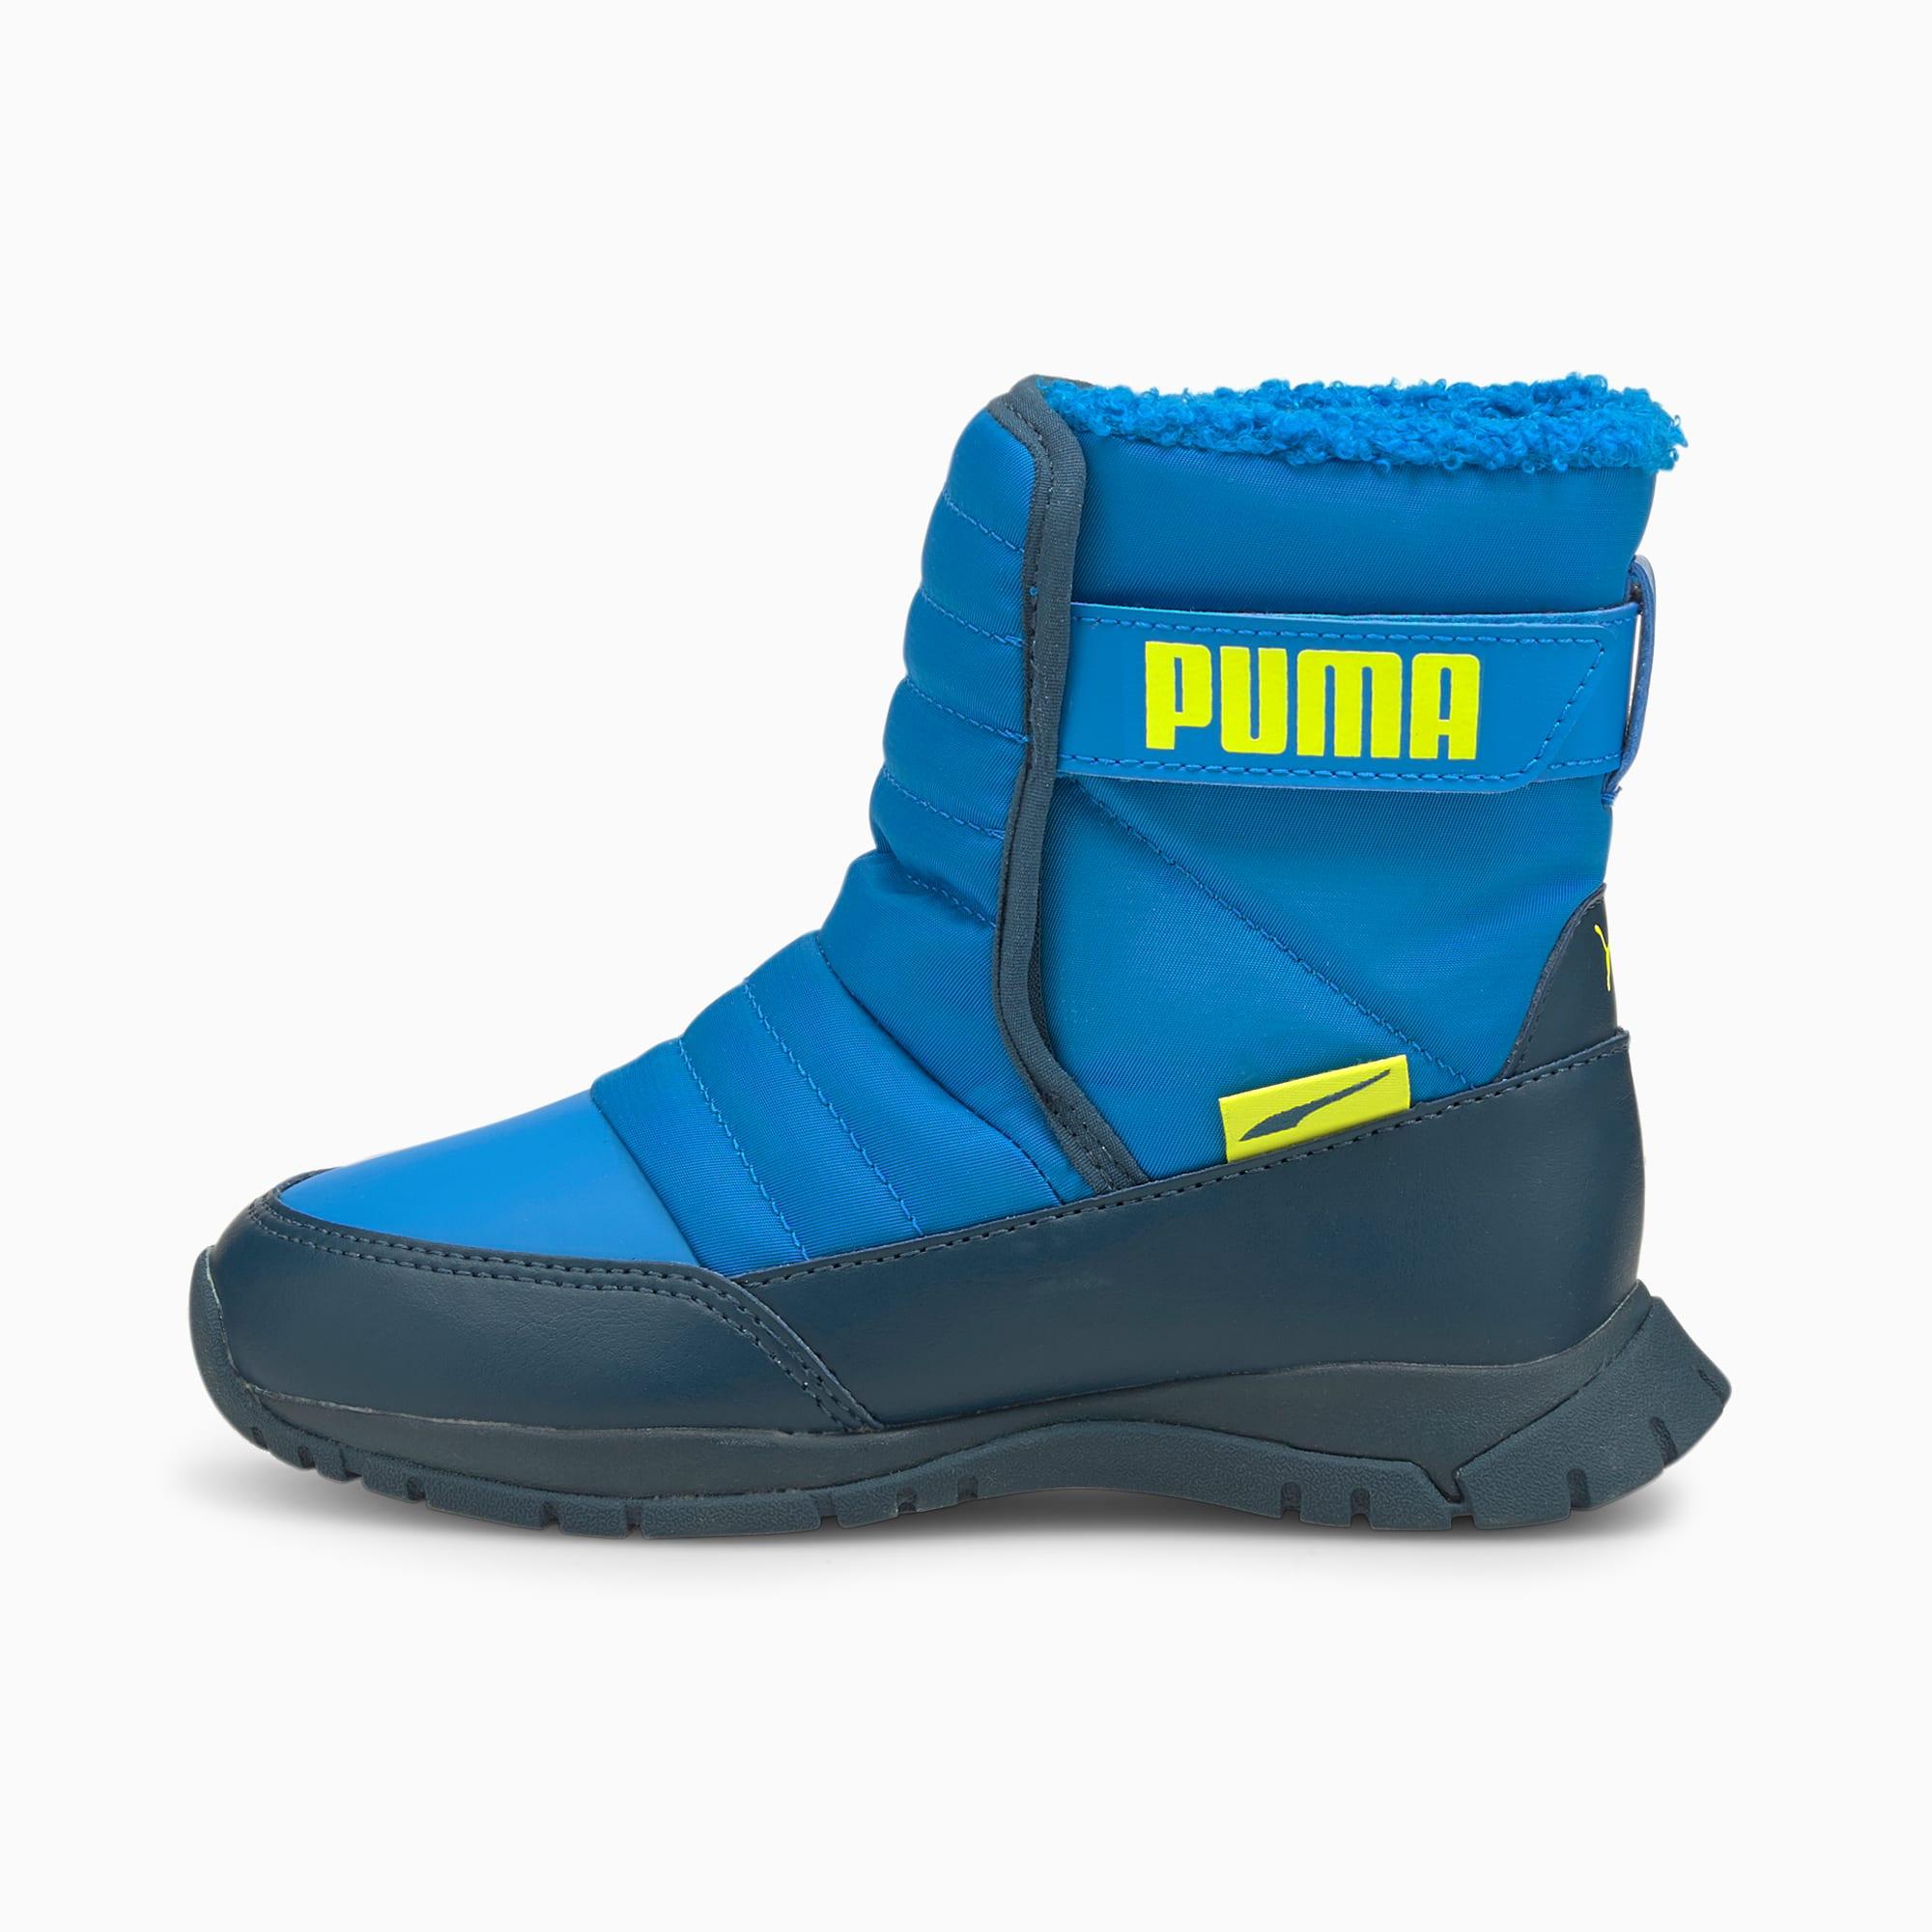 PUMA Chaussure Bottes Nieve Winter enfant, Bleu/Jaune, Taille 29, Chaussures